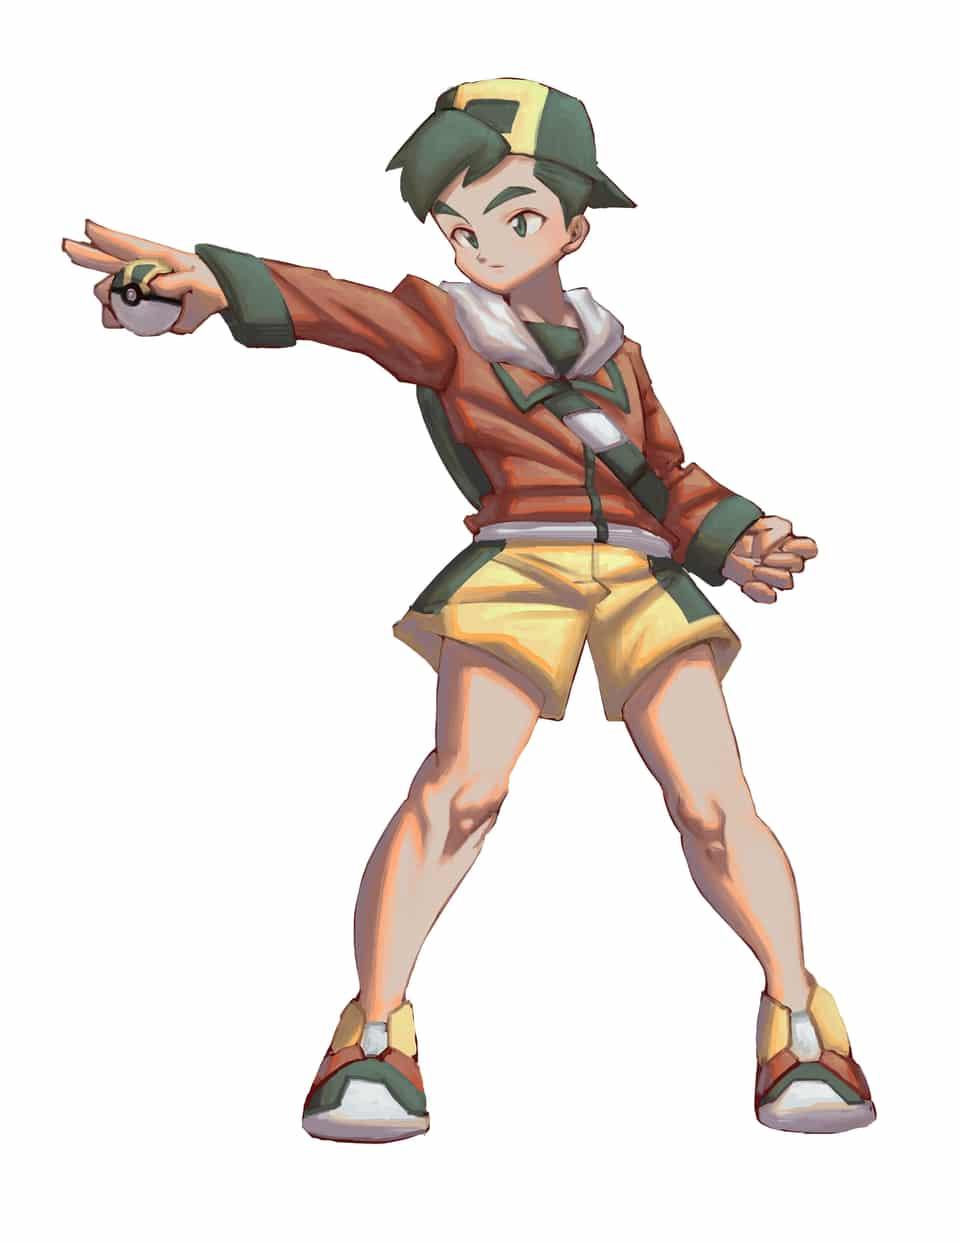 ··· Illust of Just PokémonSwordandShield 宝可梦 マリィ(ポケモン)